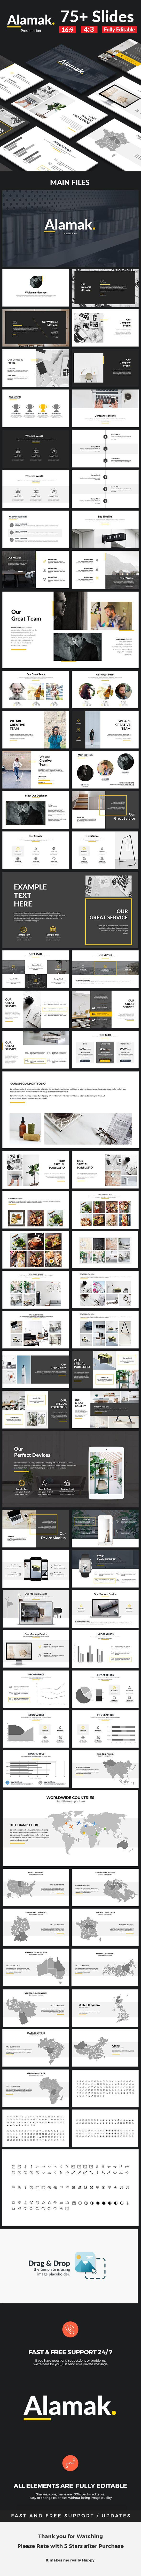 Alamak Powerpoint Template. Download here: http://graphicriver.net/item/alamak-powerpoint-template/16771766?ref=ksioks